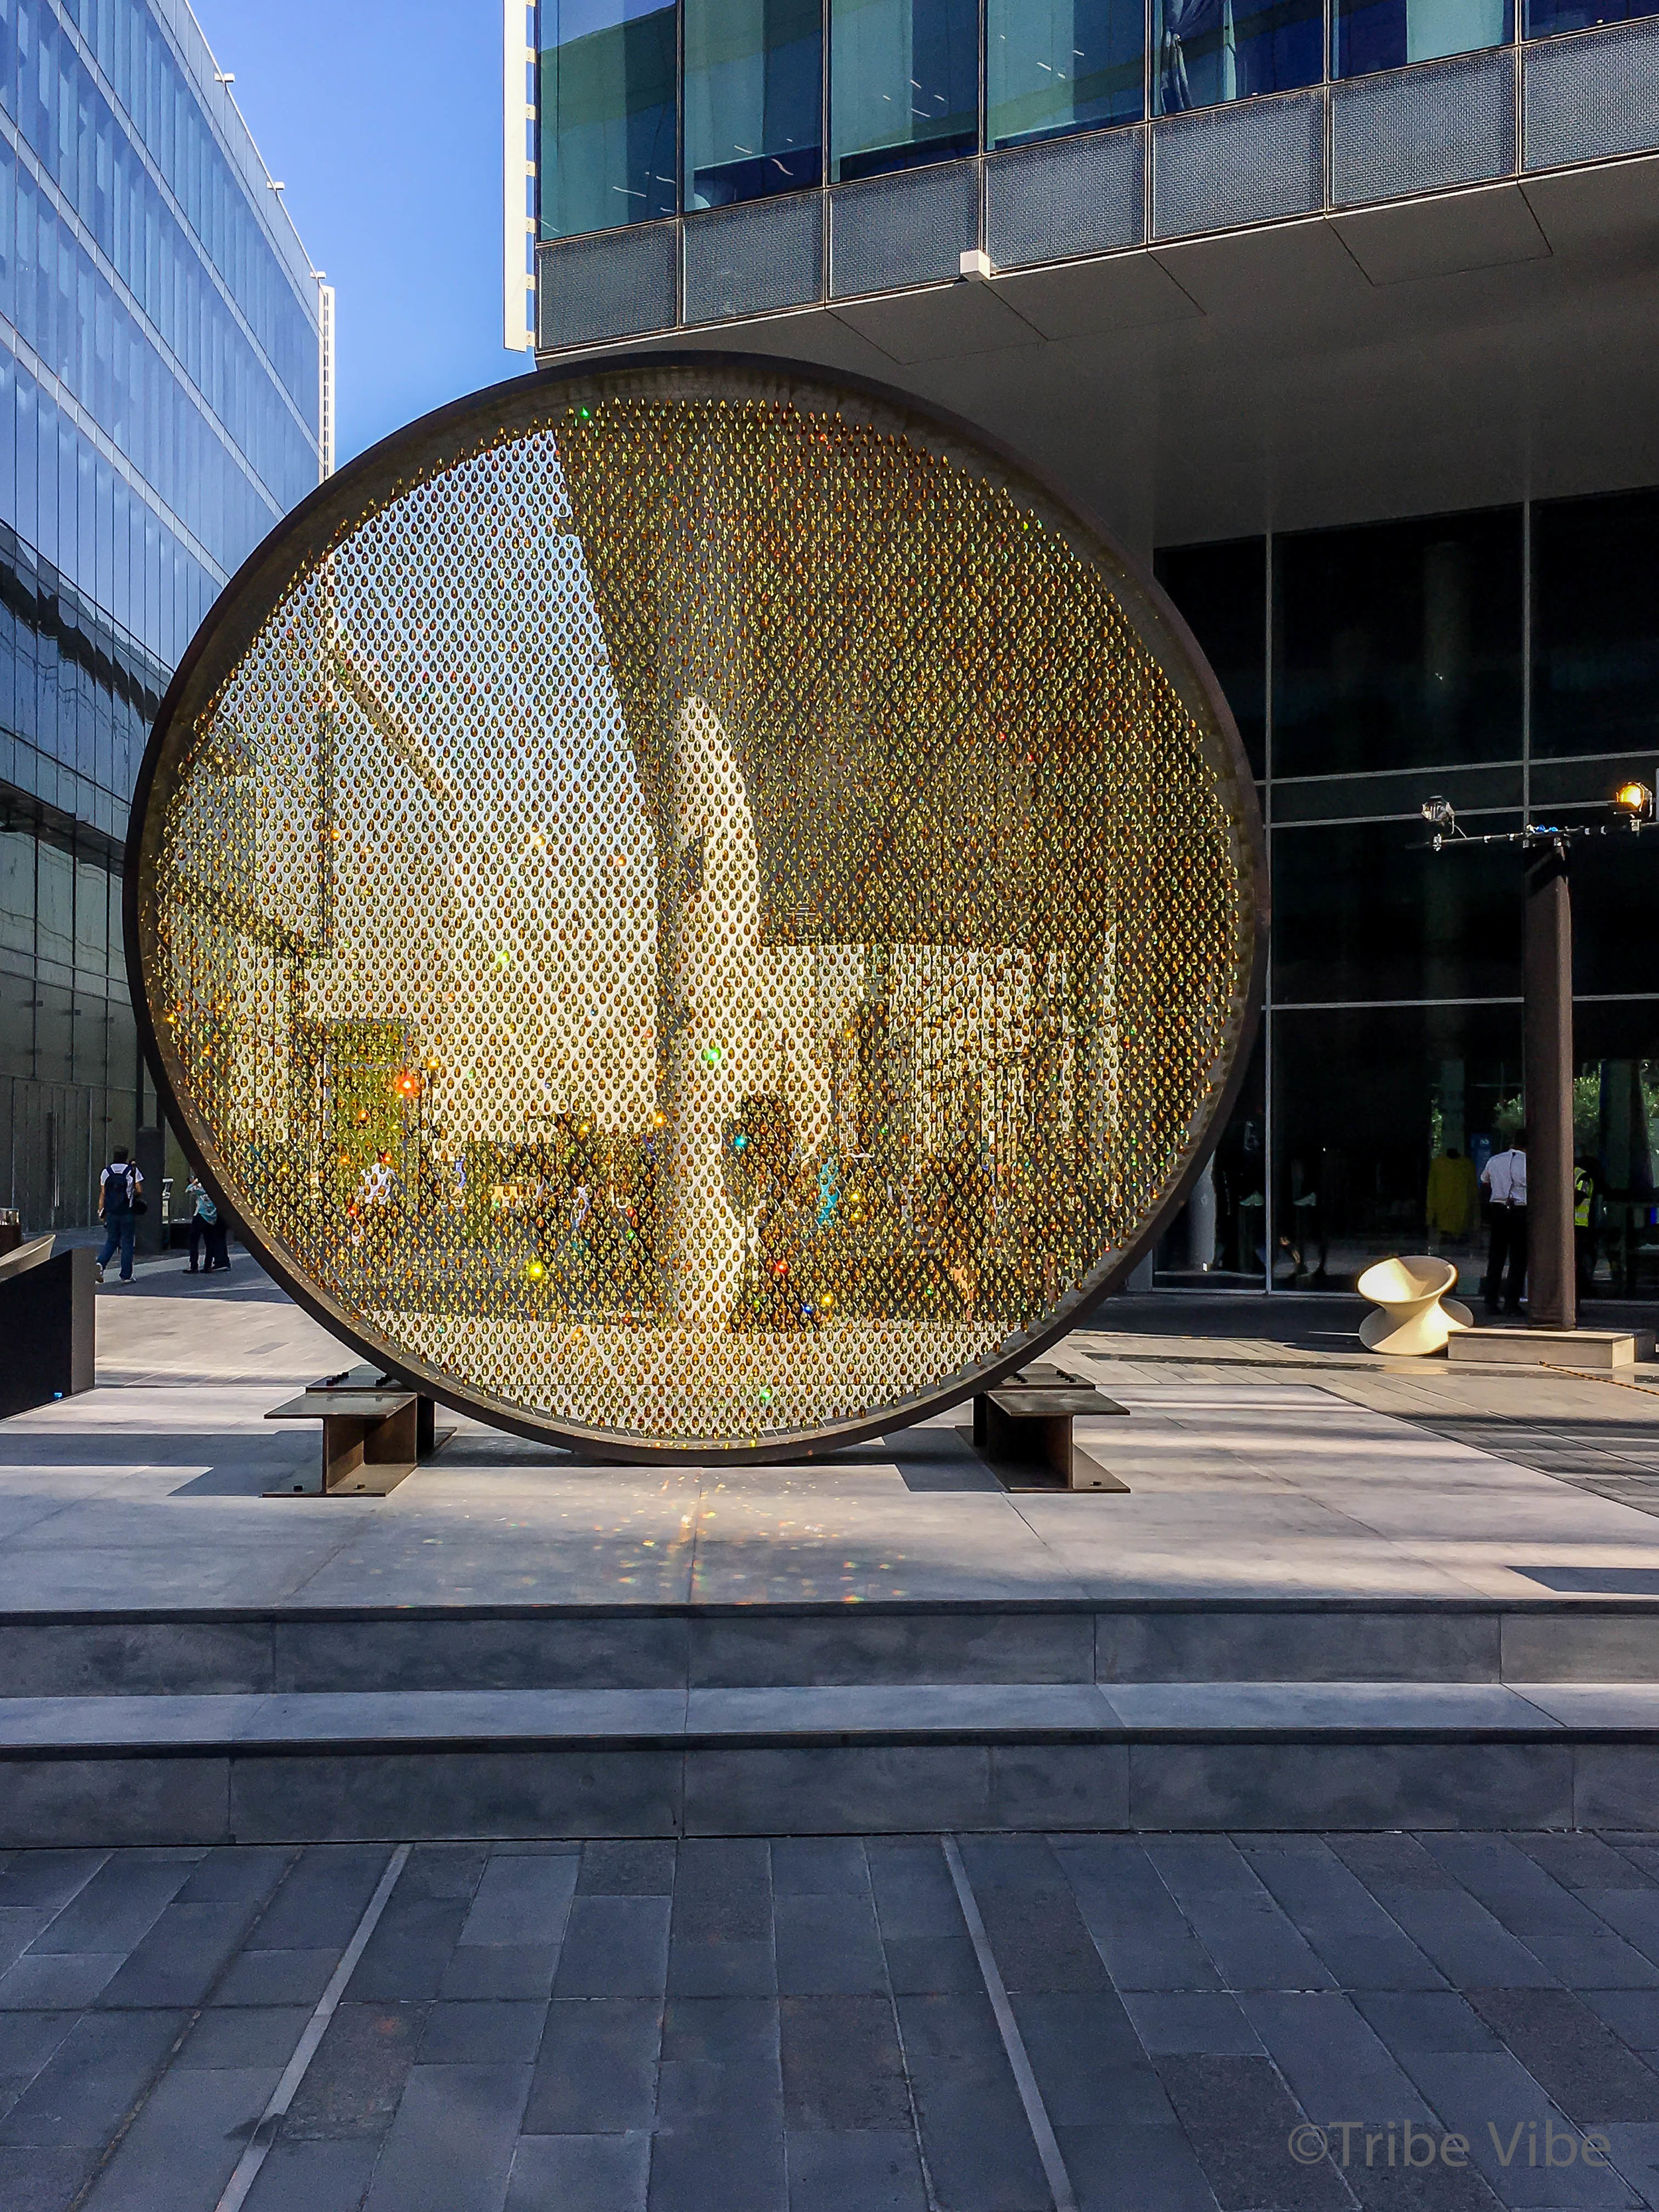 Dubai sun made from Swarovski crystals